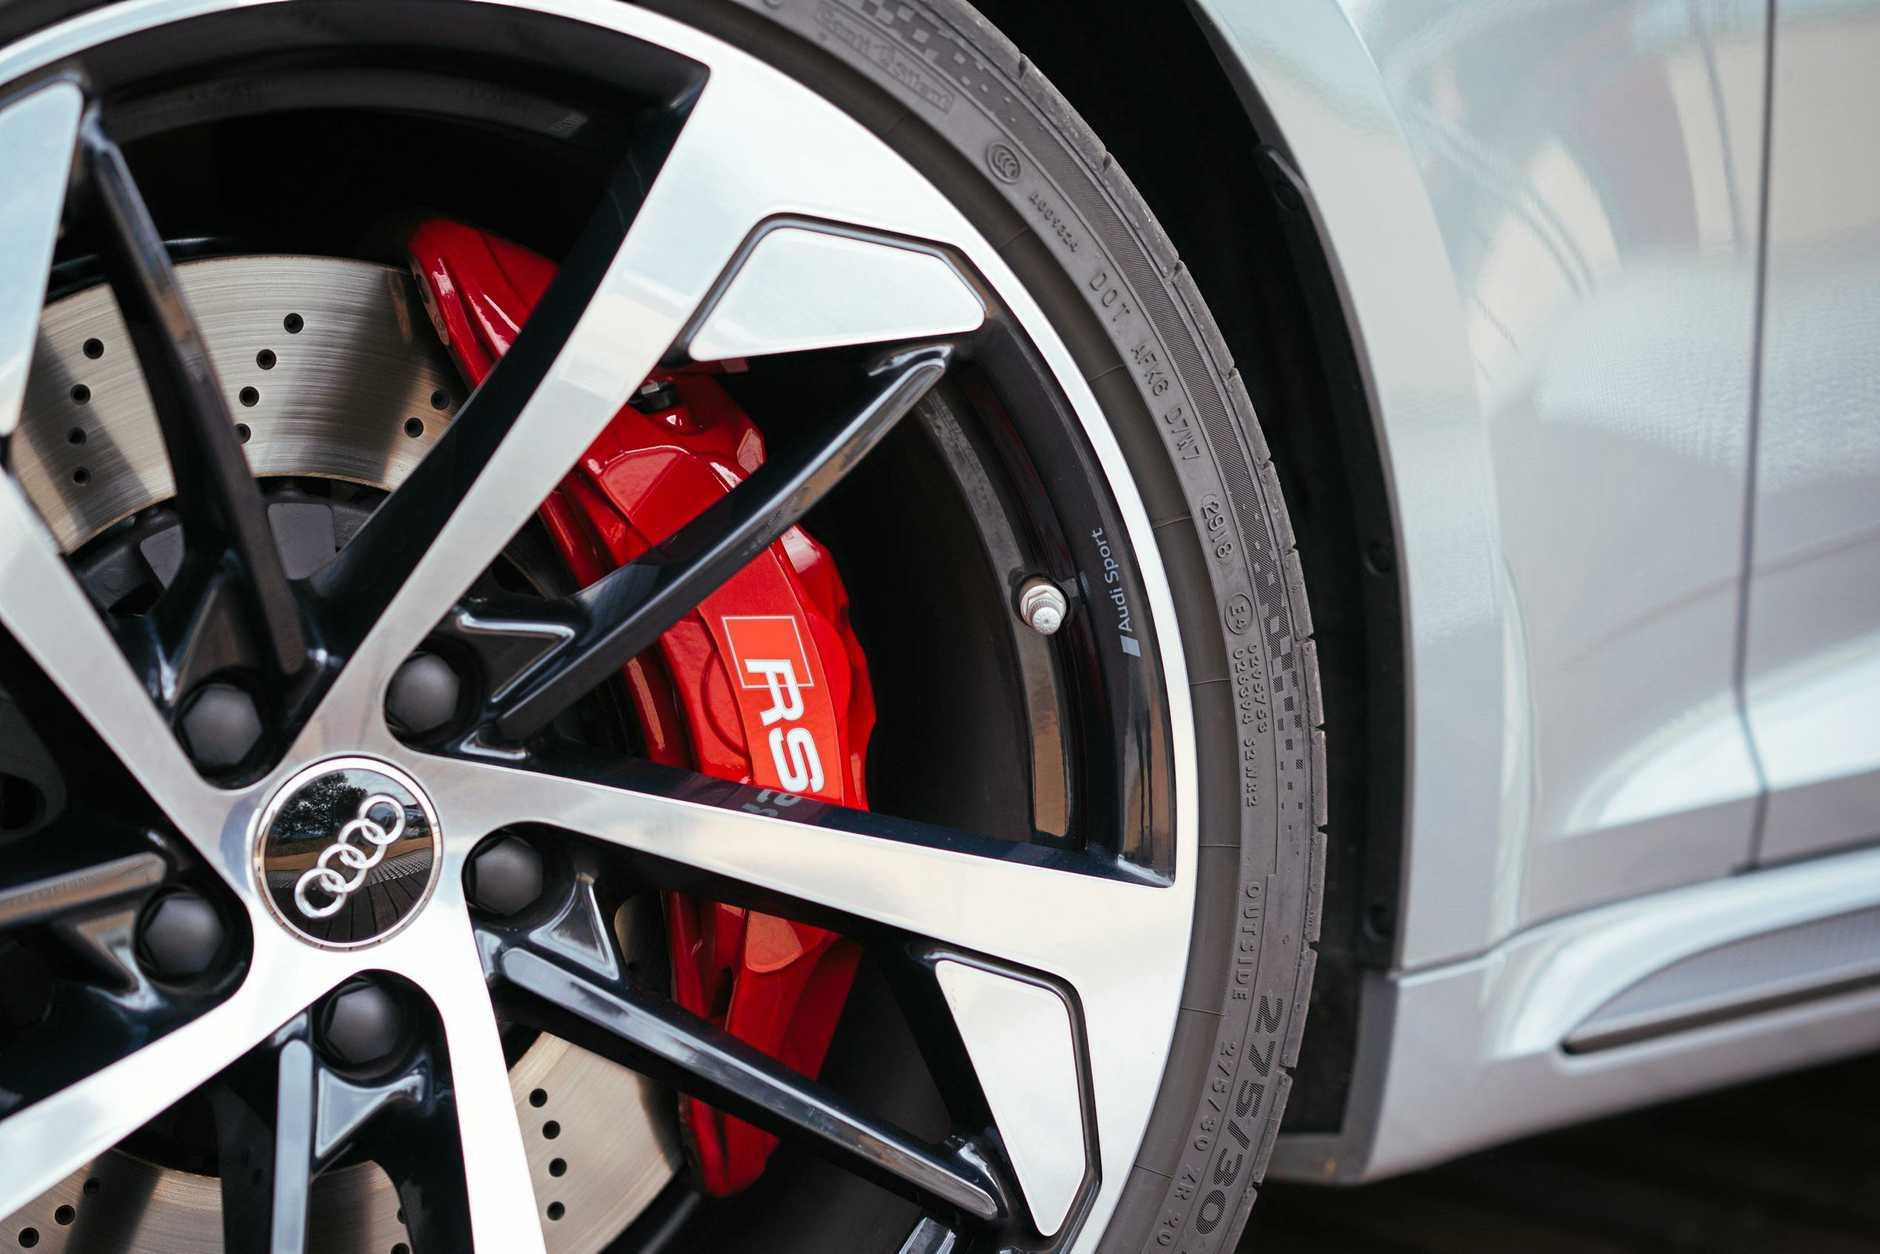 The 2019 model Audi RS5 Sportback.